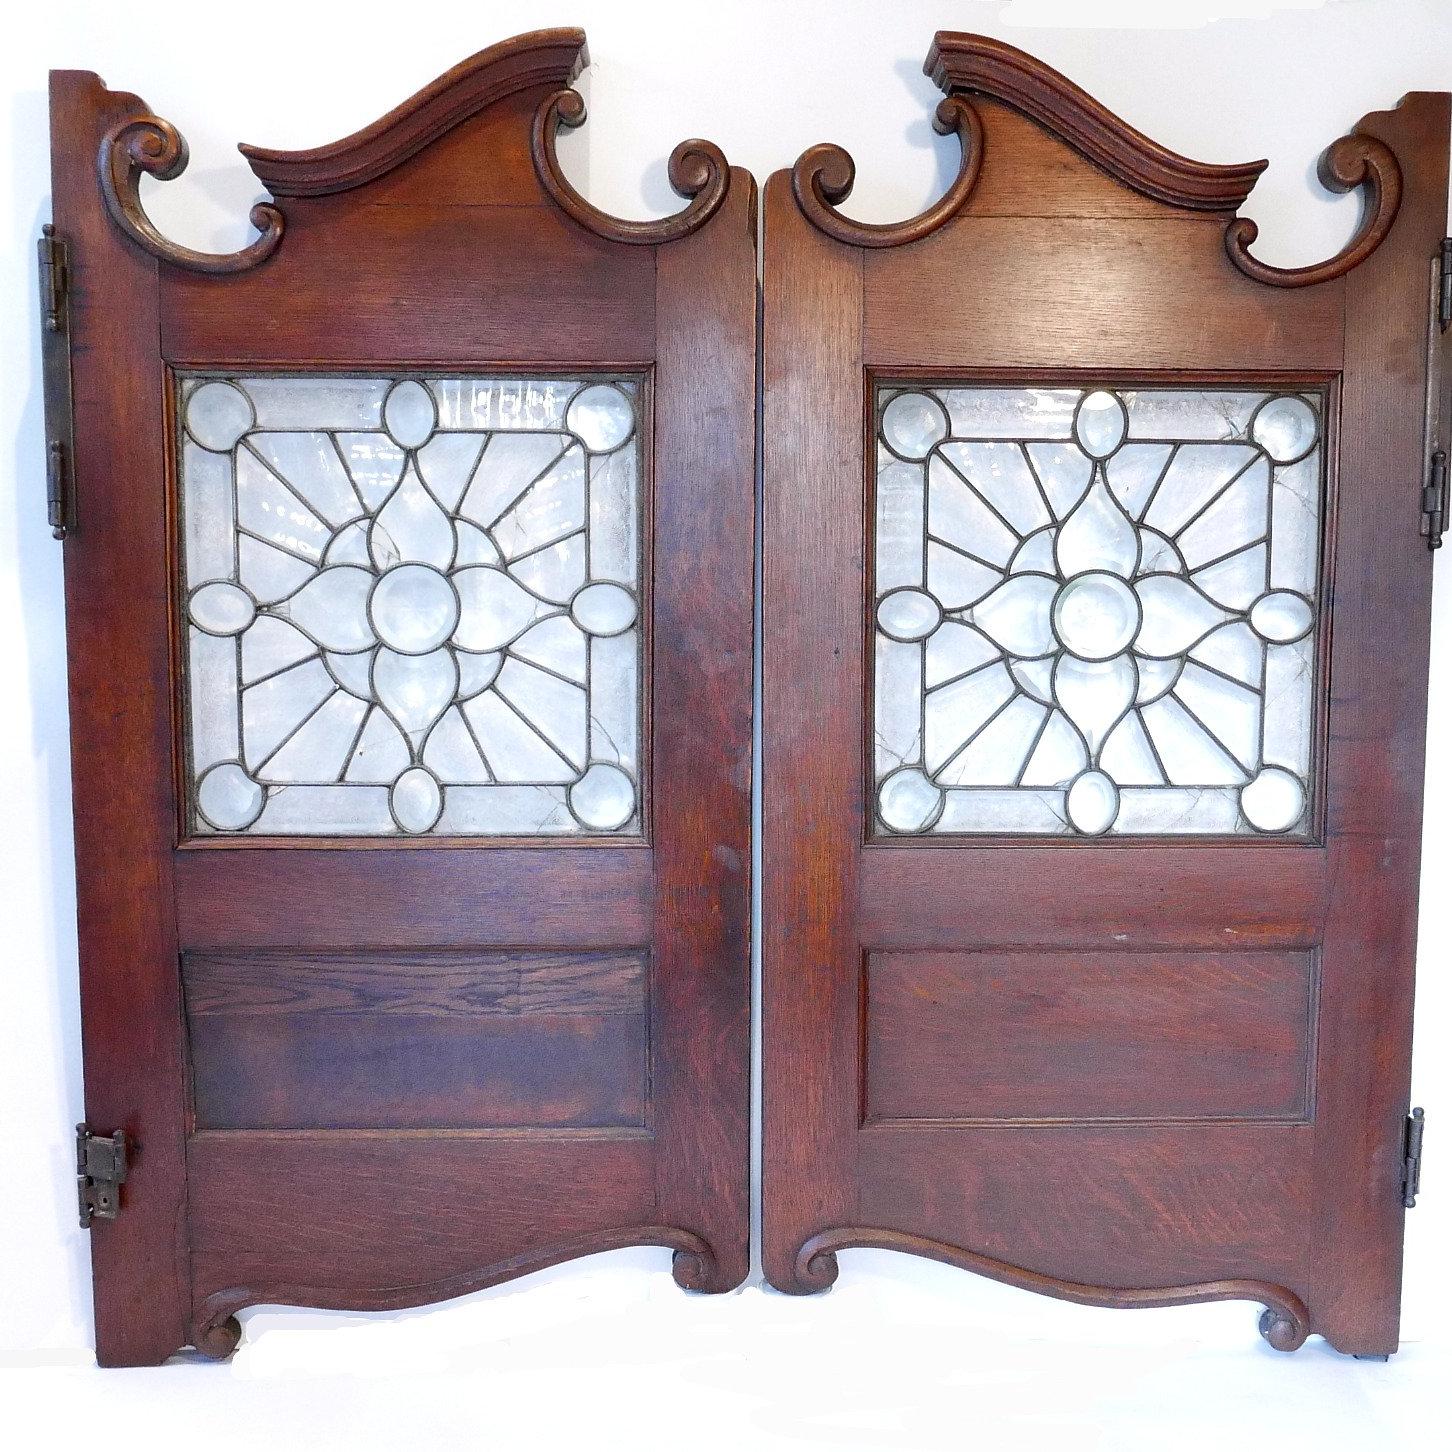 Circa 1880's Antique Saloon Doors - Michael Friedman Antiques & Decorative Arts Dealer Friedman